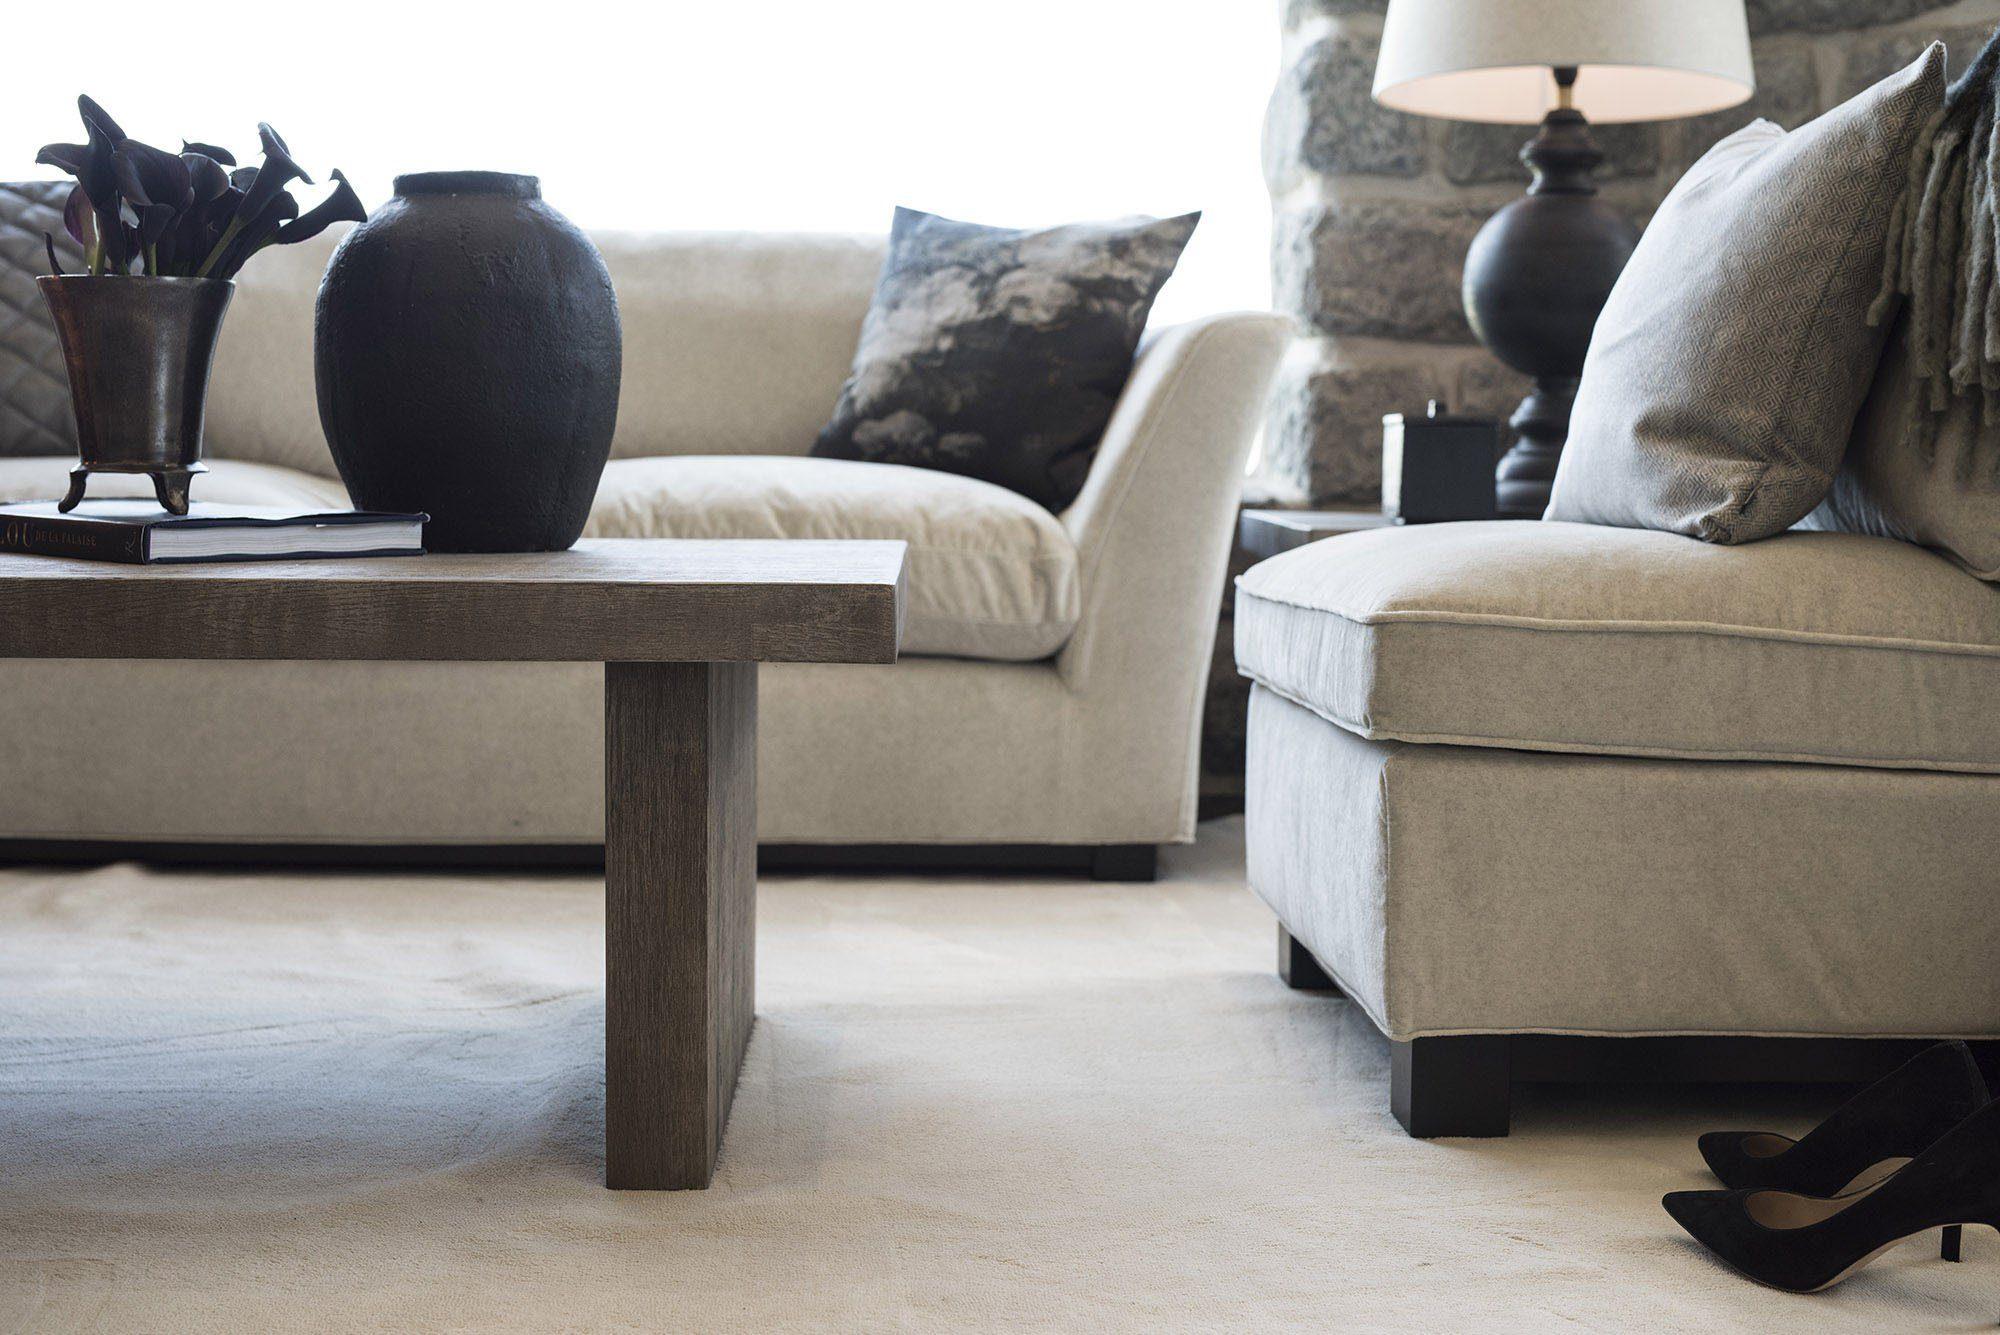 New Soho soffa, Plint soffbord och Midtown fåtölj i tyget Barkley Offwhite.